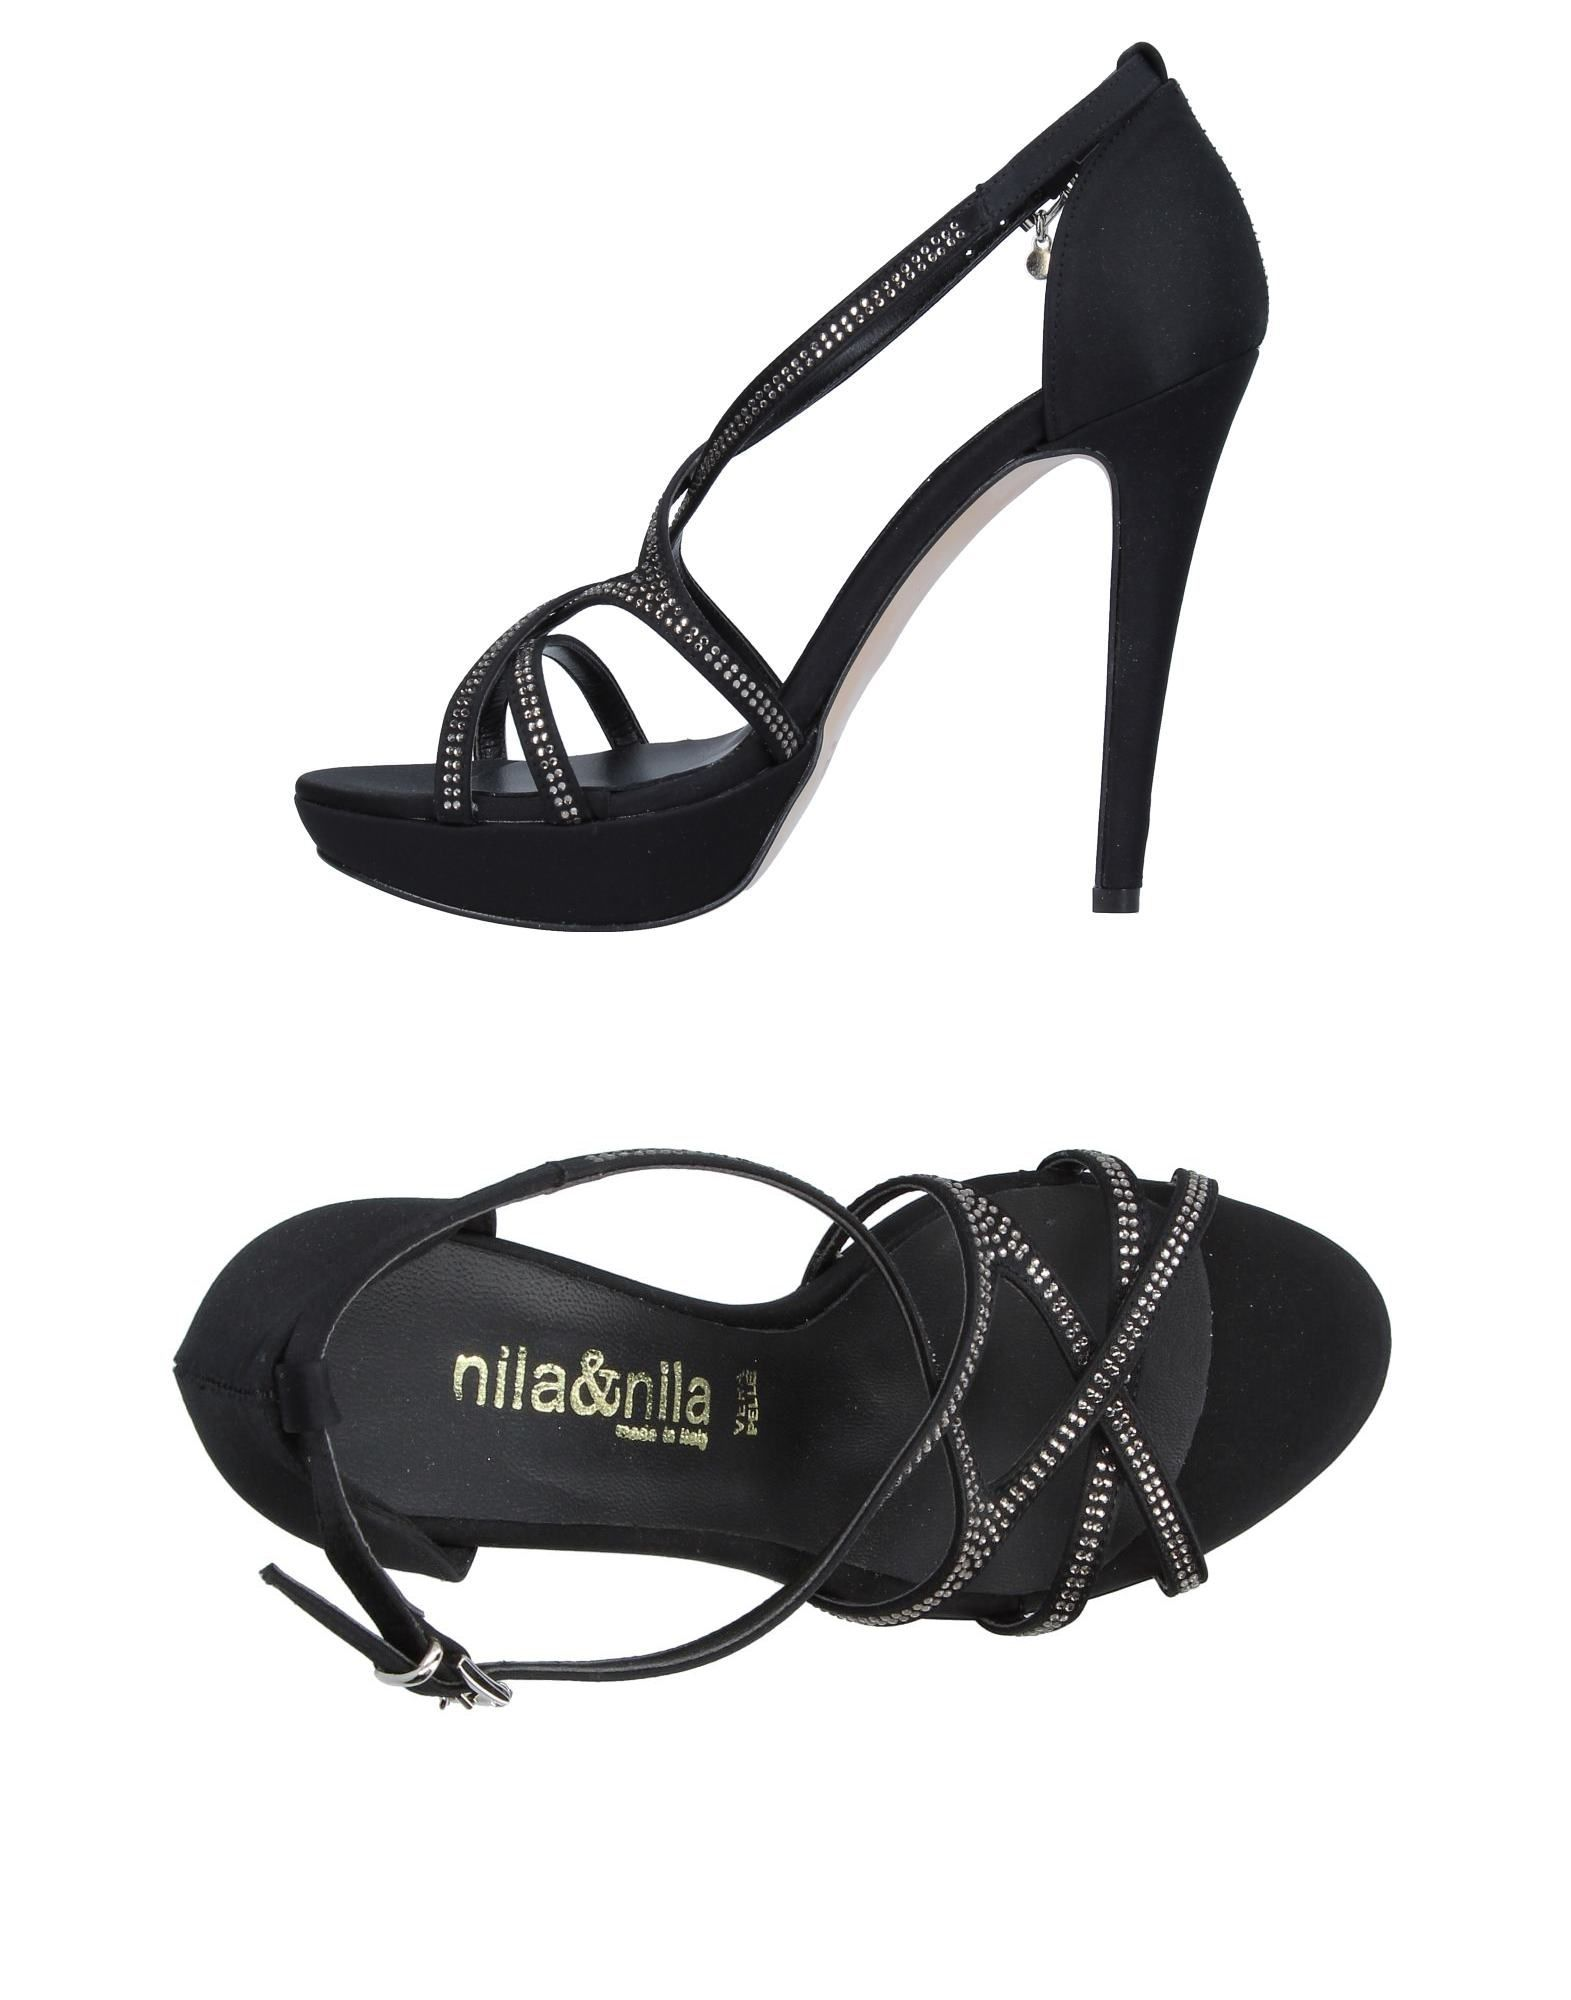 Nila & Nila Sandalen Damen  11347502QN Gute Qualität beliebte Schuhe